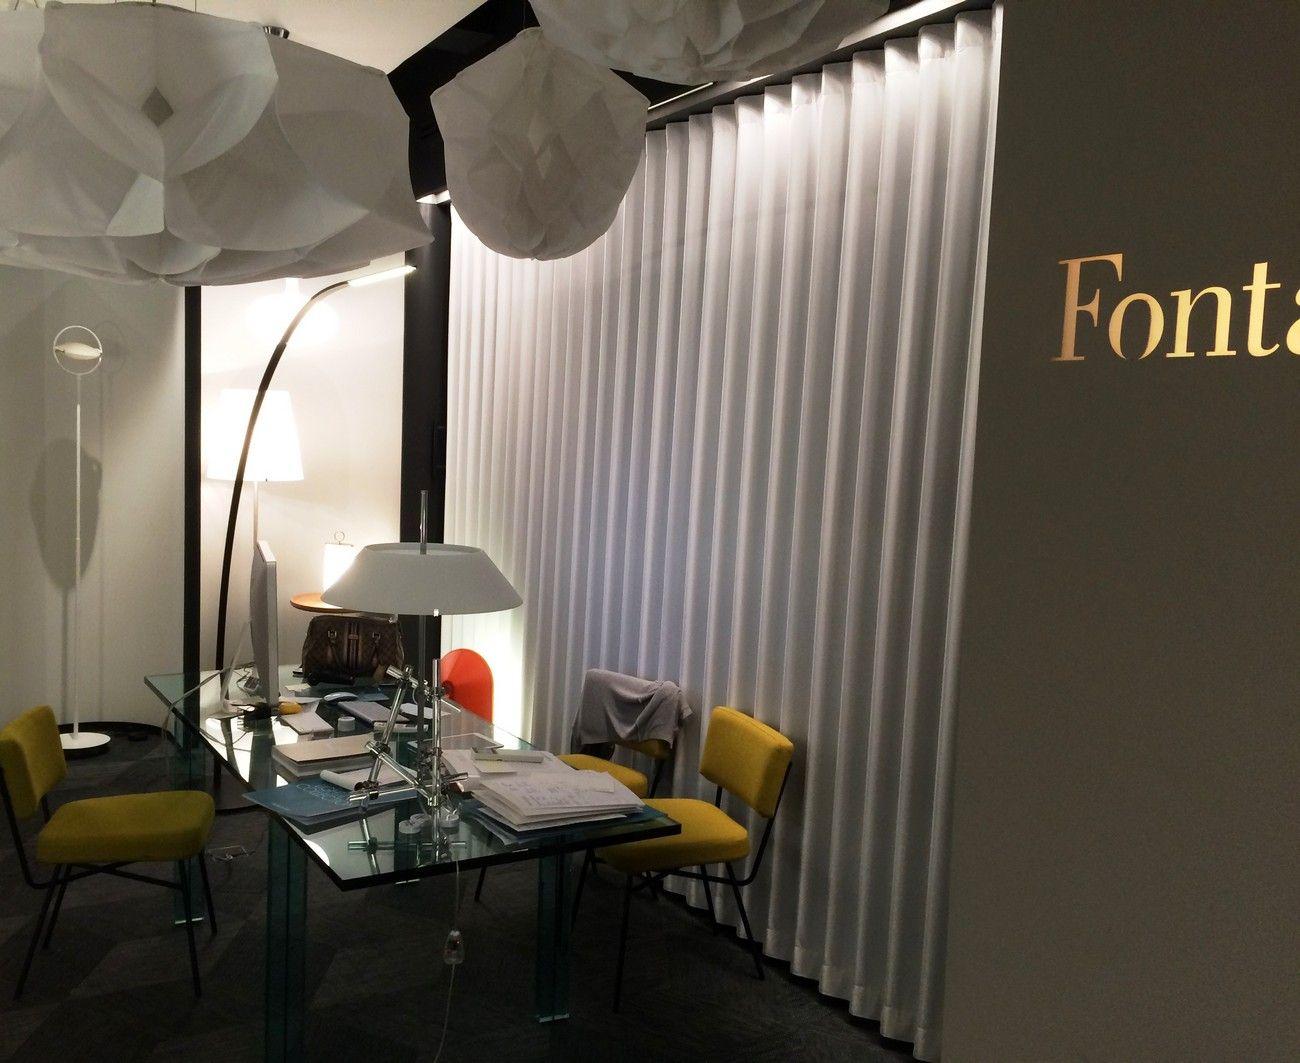 Fontana Arte - showroom Milano - FanoflexFanoflex   Fanoflex Folding ...